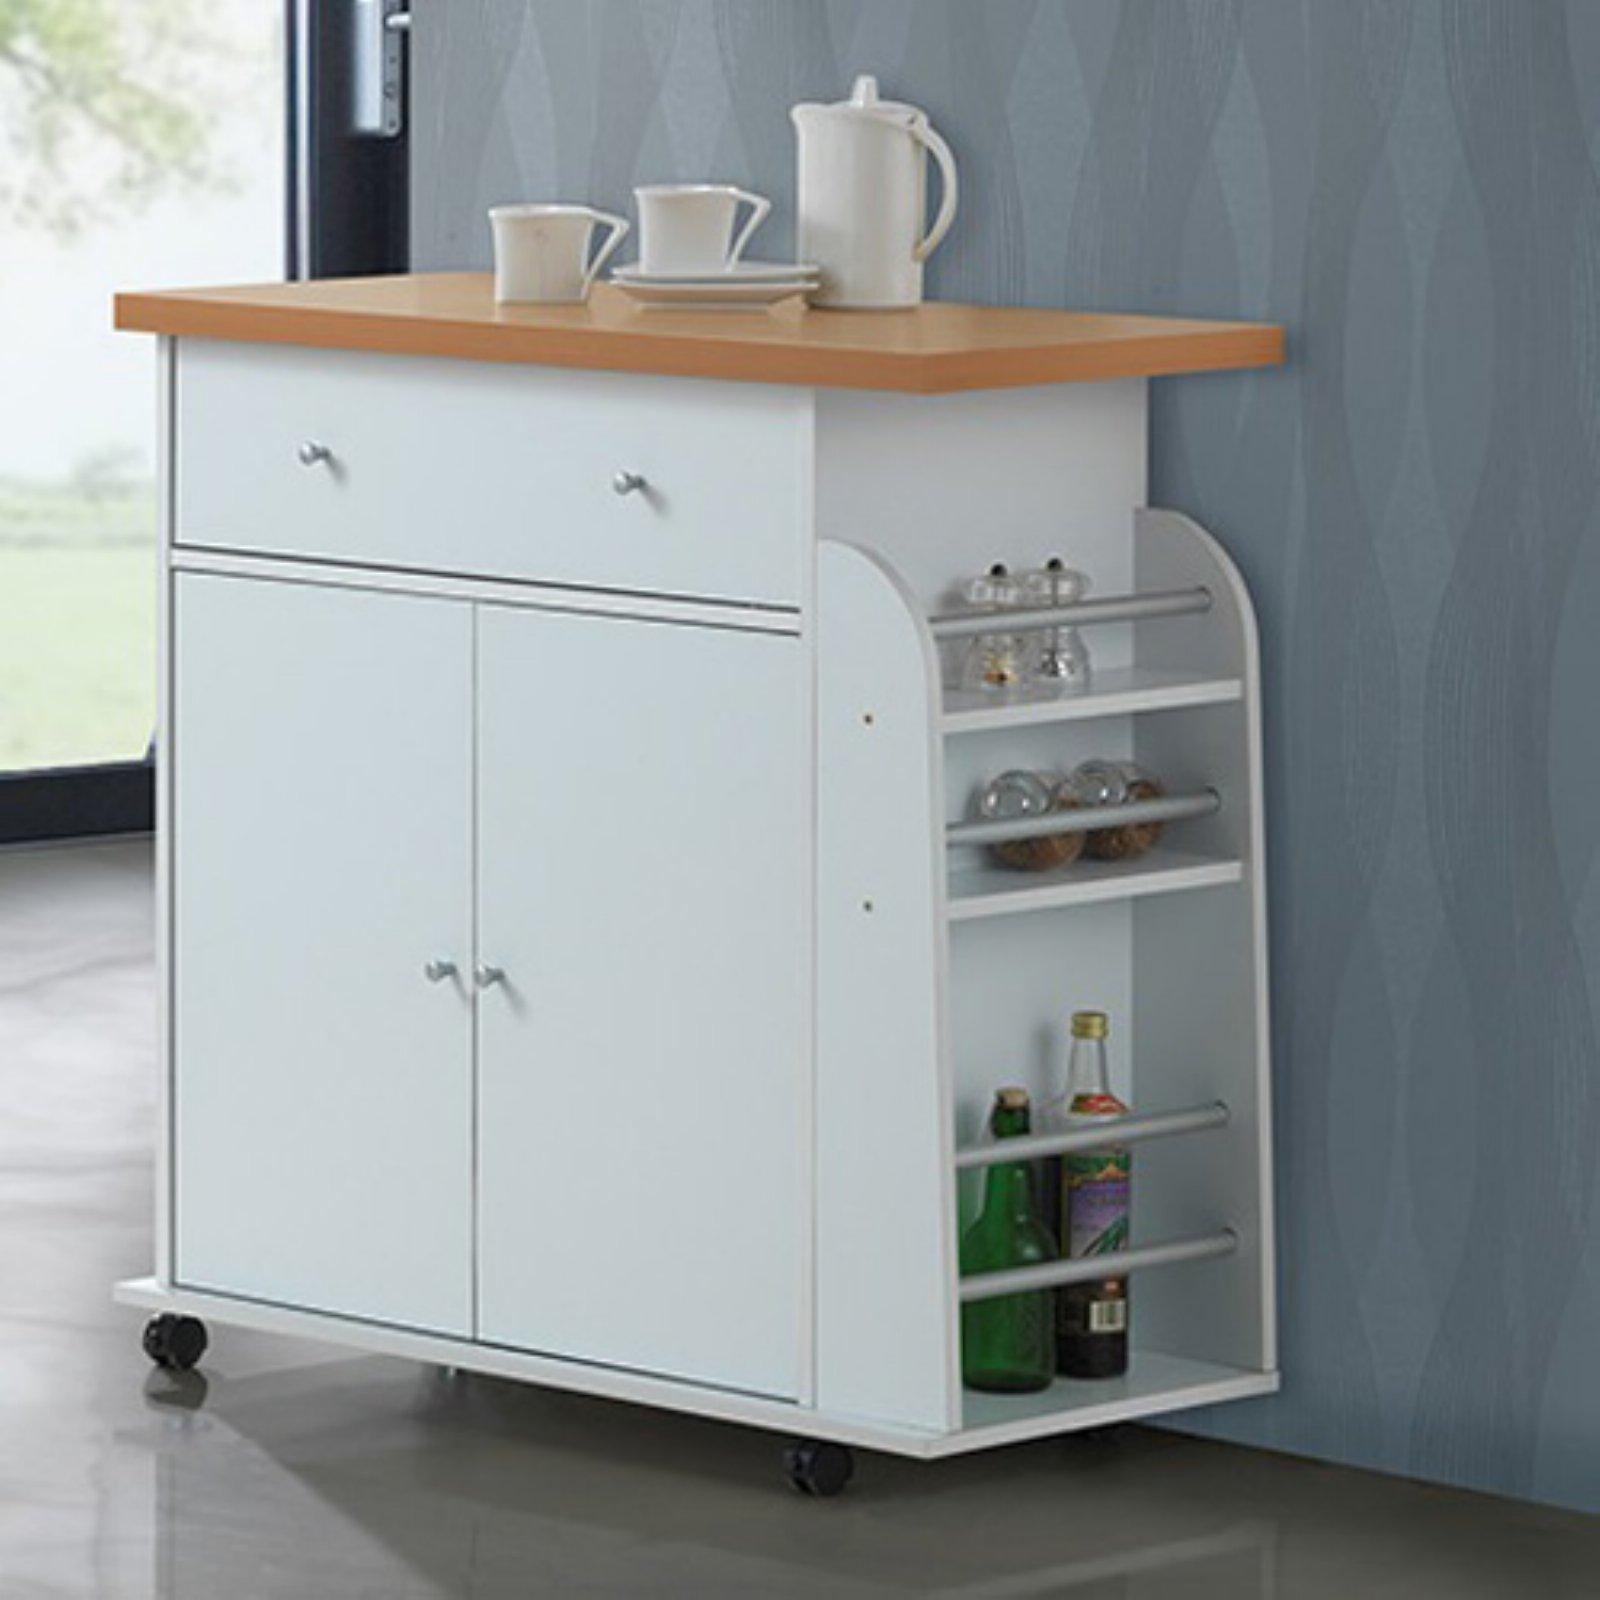 Hodedah Portable Kitchen Cart with Spice Rack